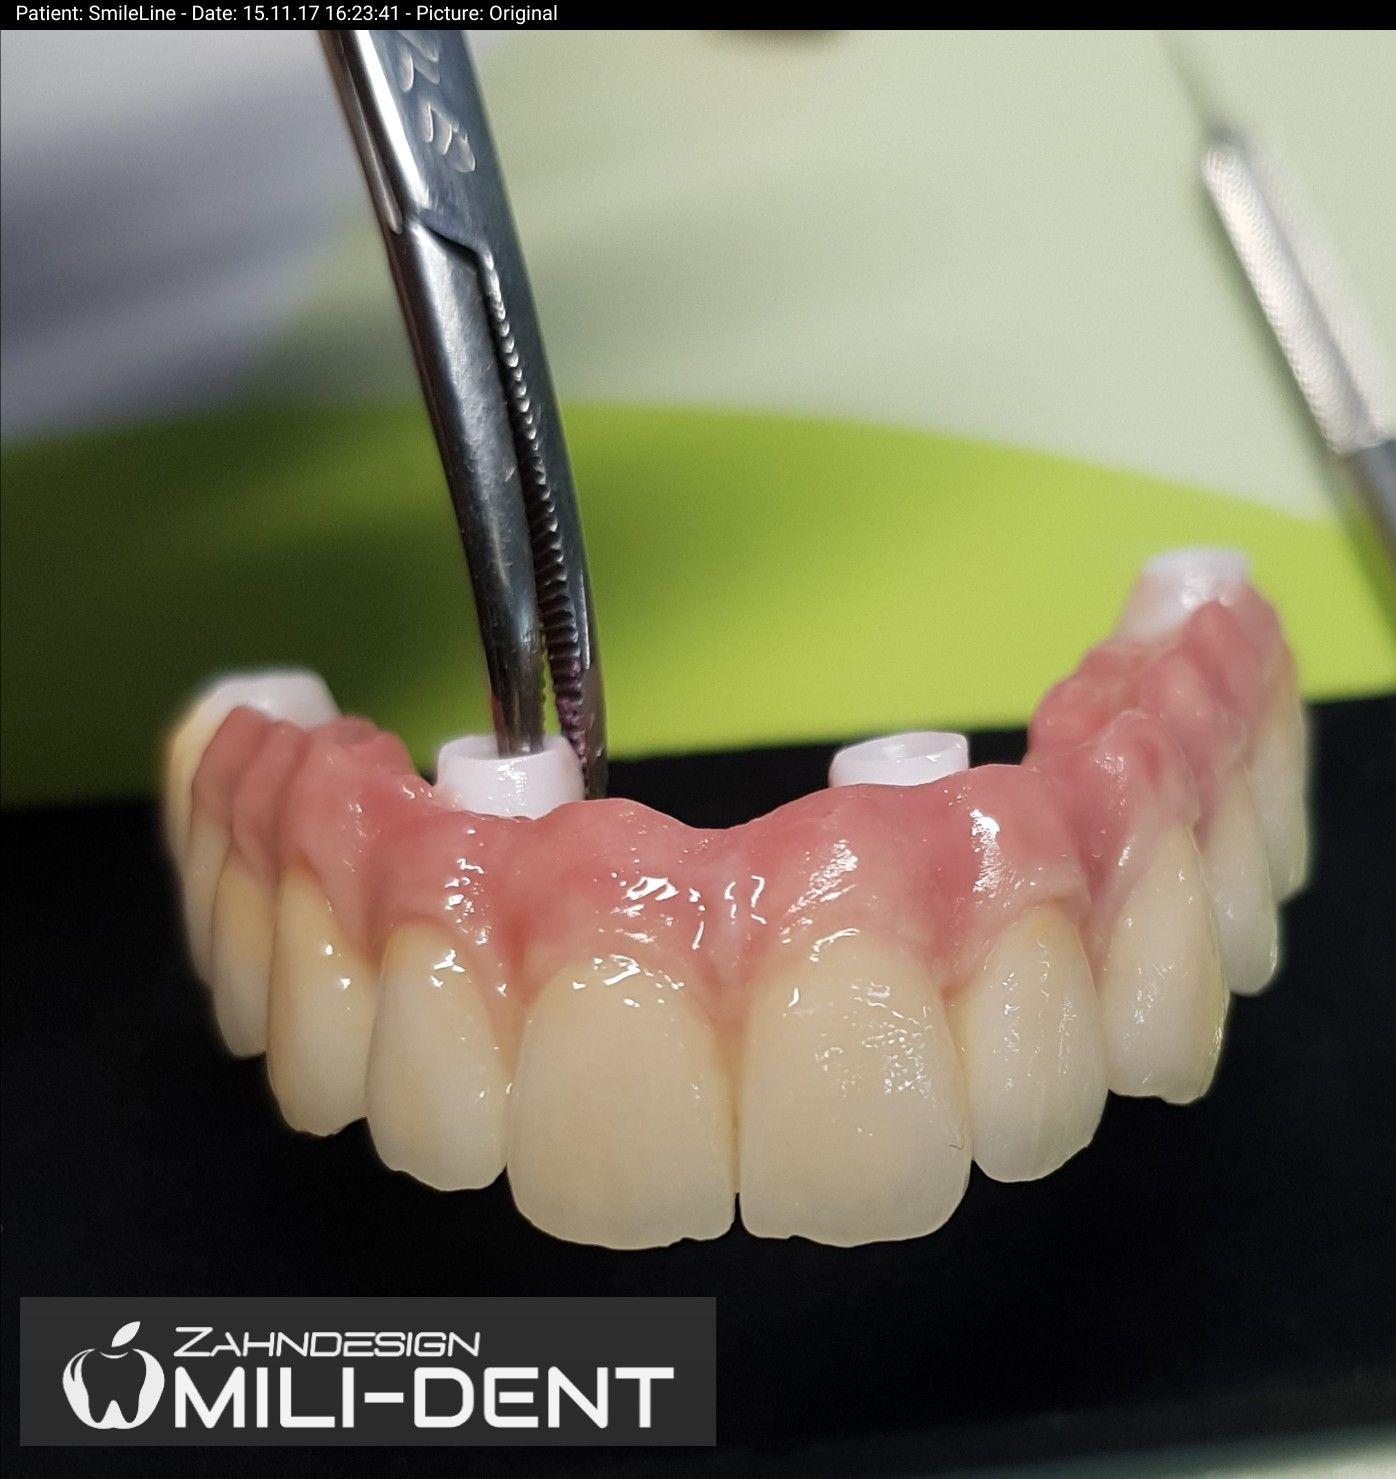 Pin By Milkica Djordjic On Educacion Dental Ceramics Dental Art Dental